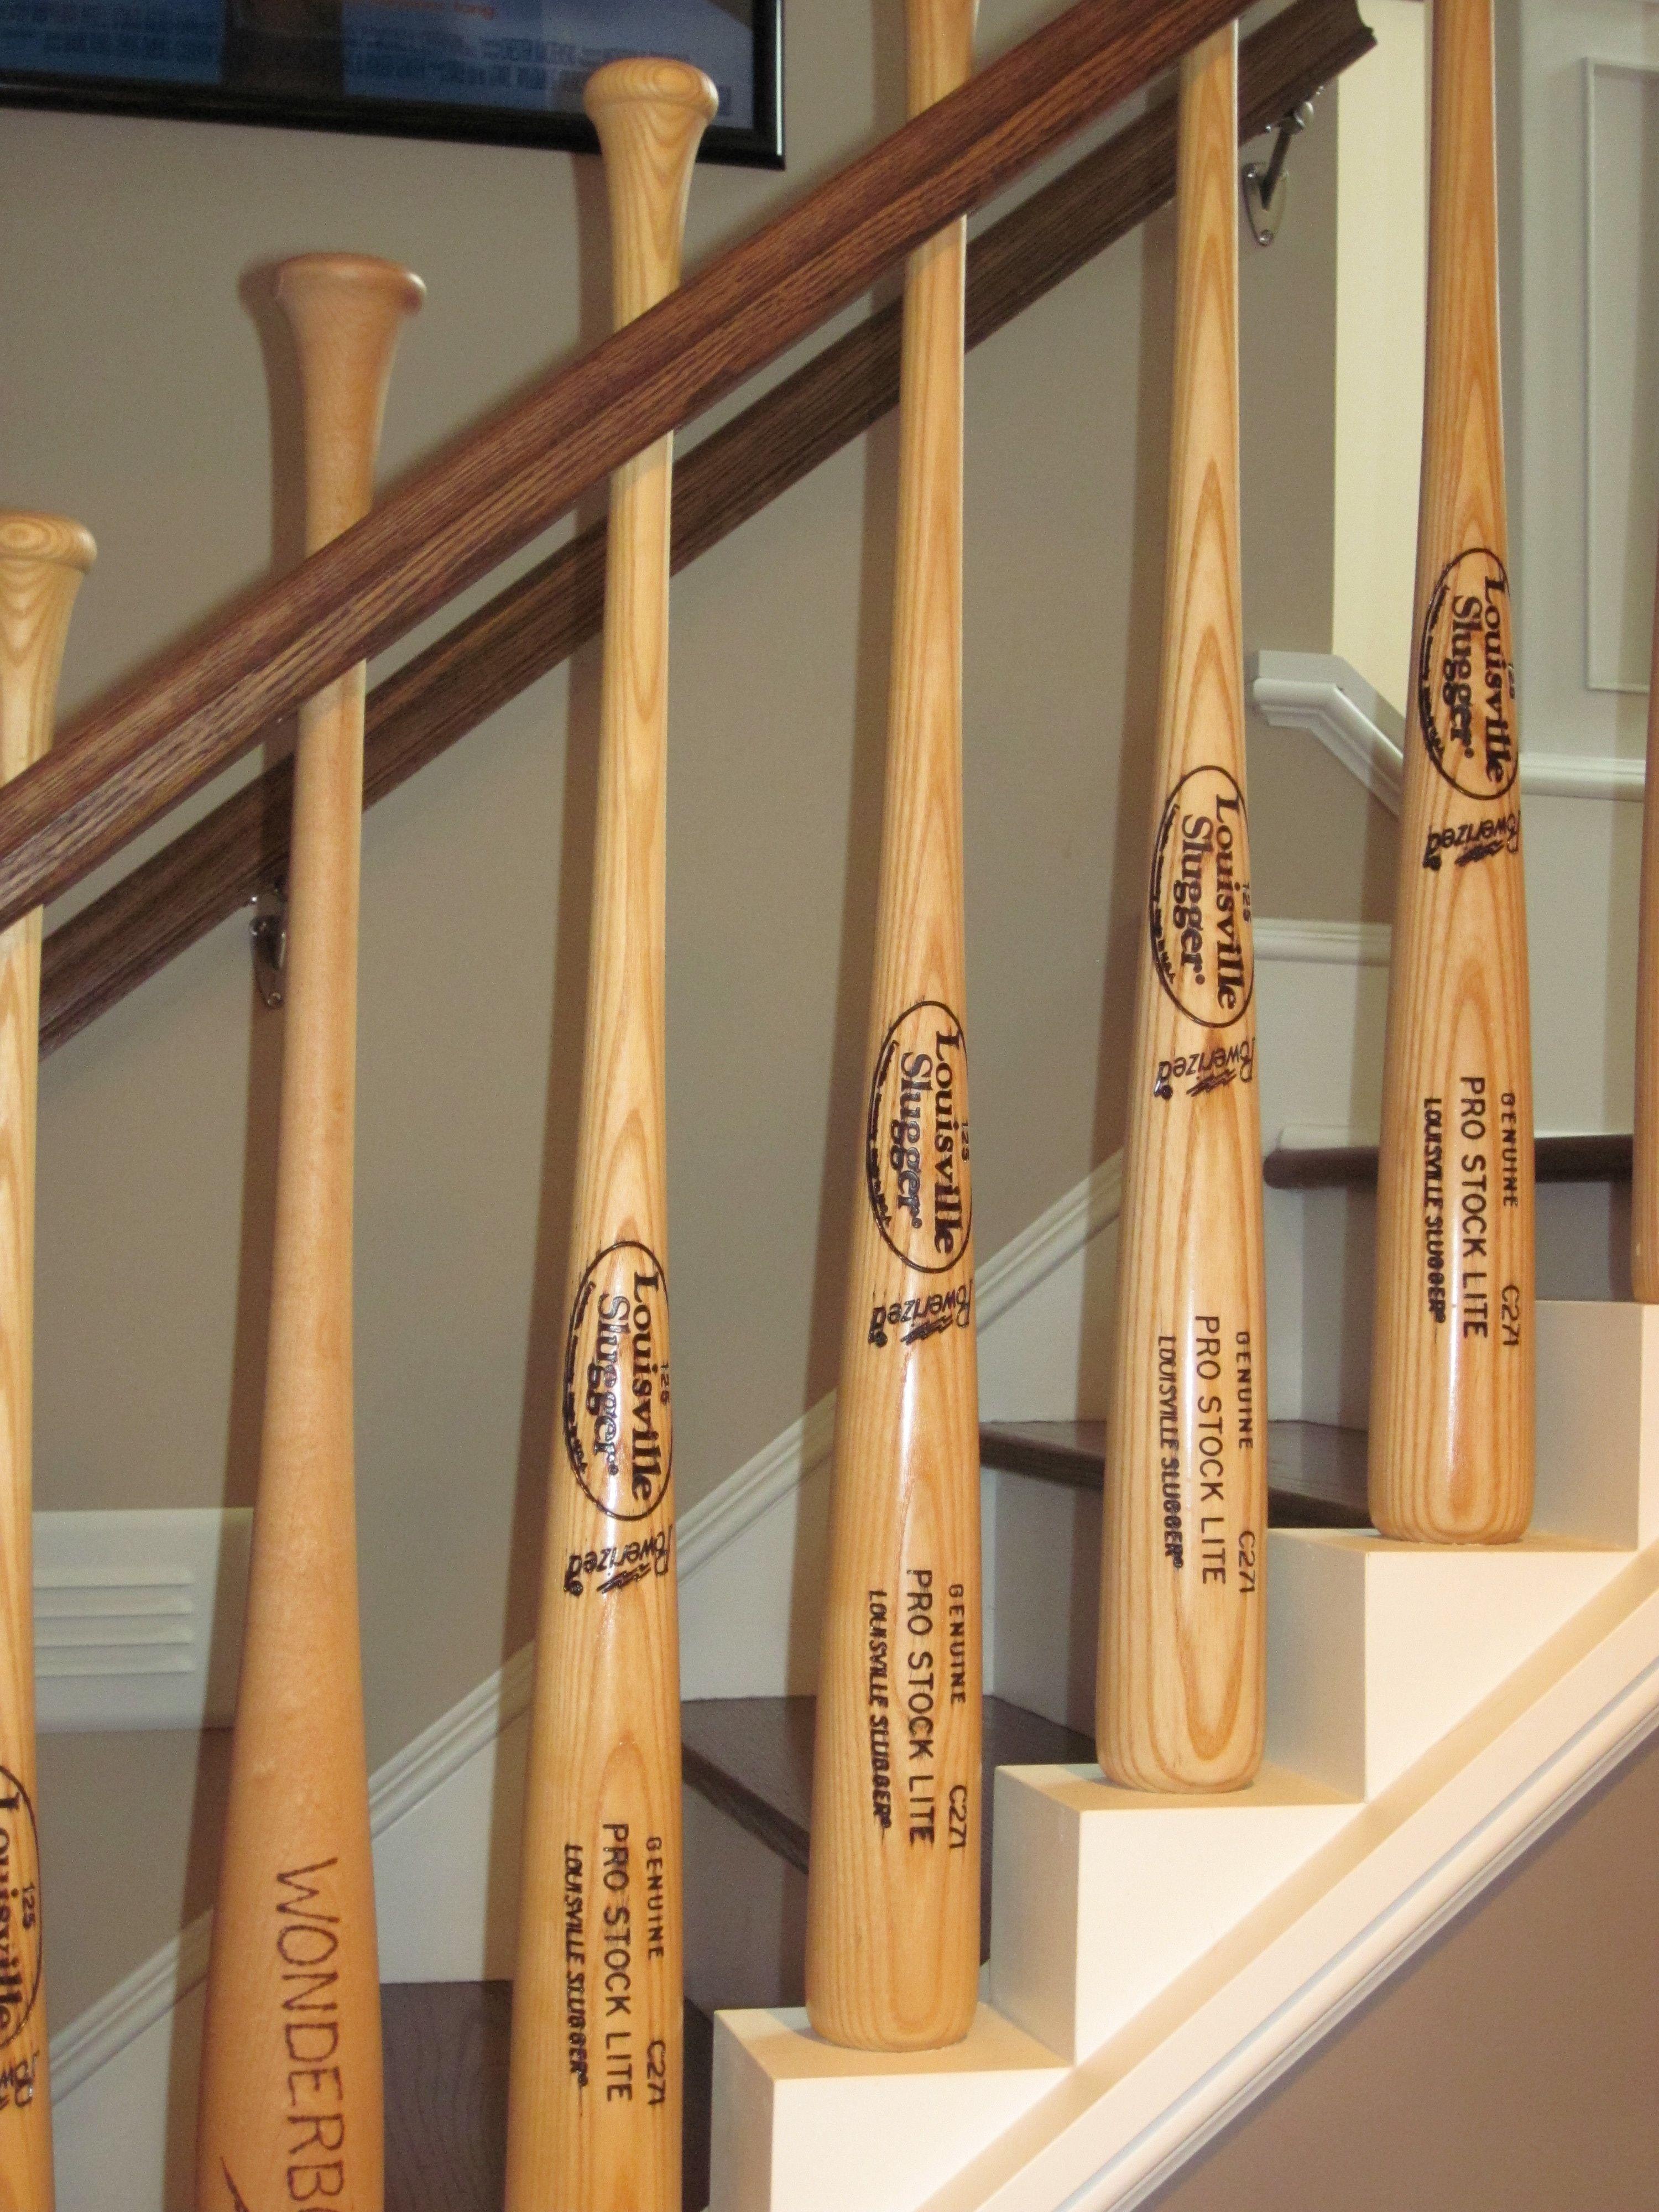 Baseball Bat Rail Cool Idea For A Stairway But I D Use Yankee Bats Ecsp Jeter